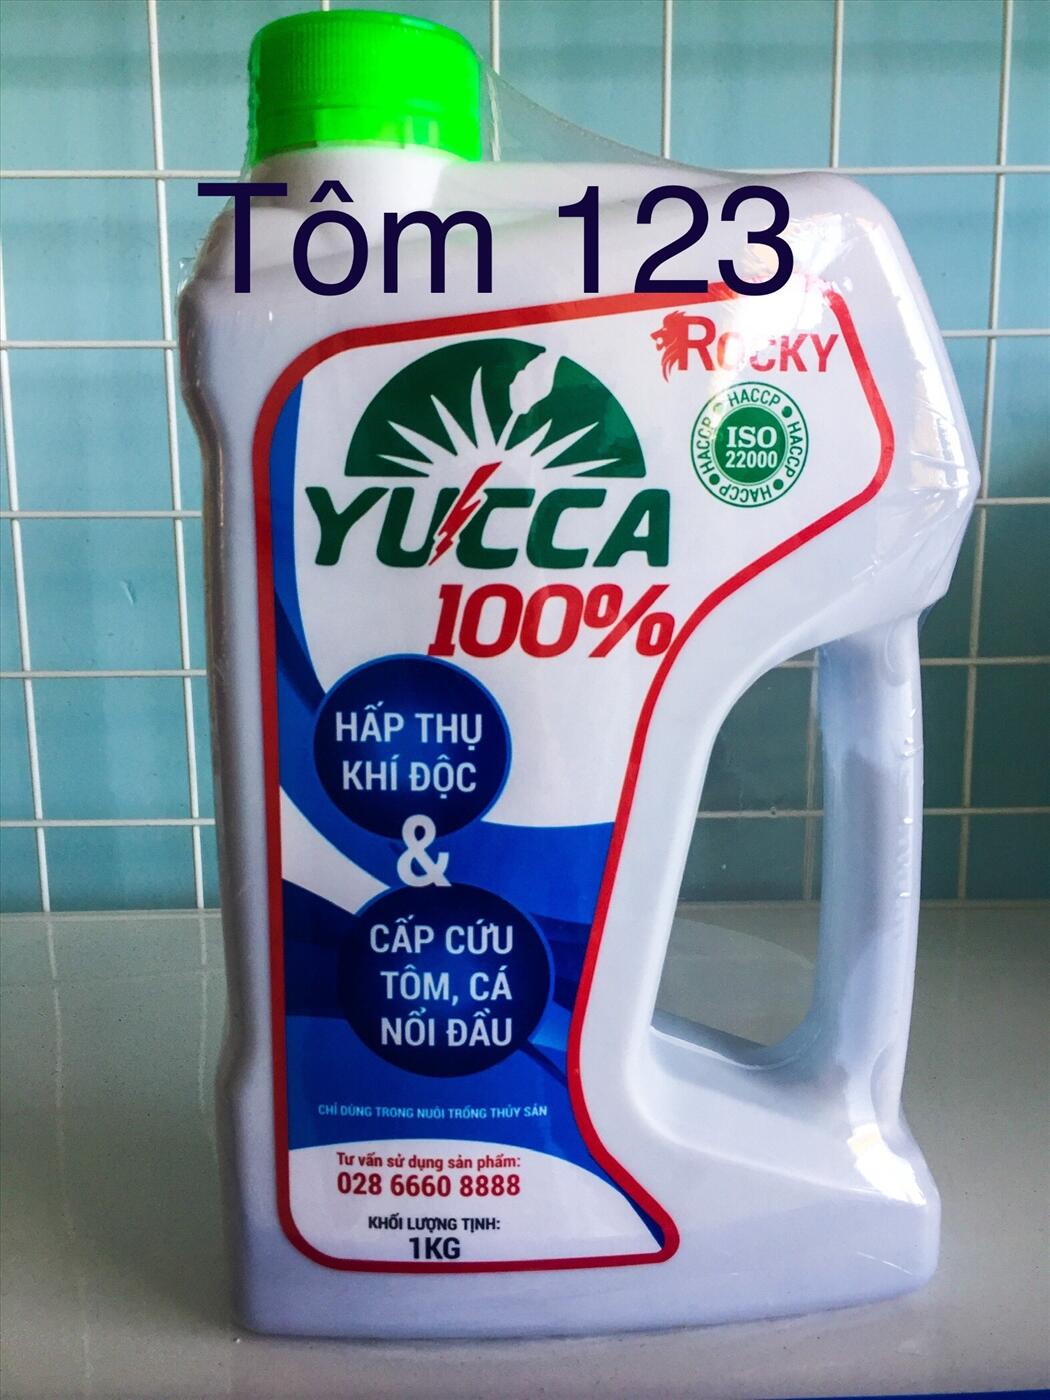 YUCCA 100%